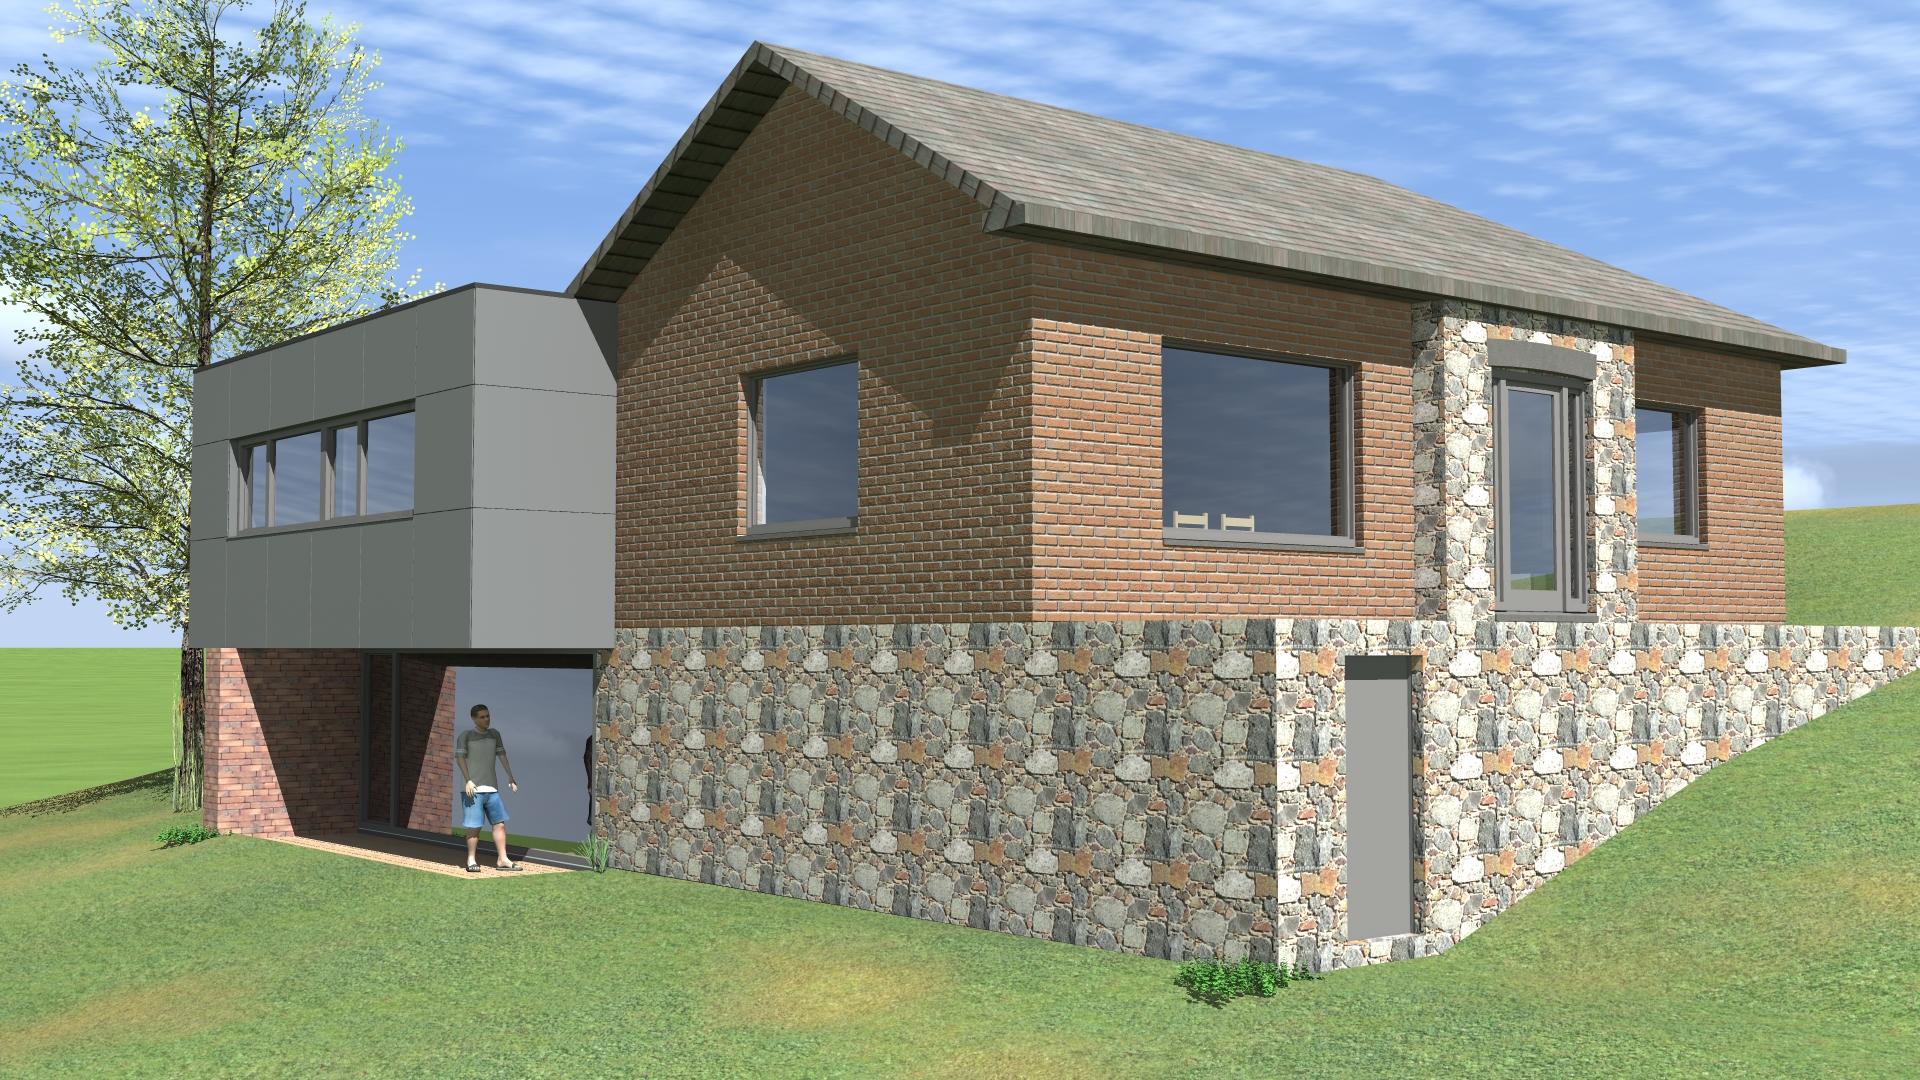 tilkin brice architecte li ge projet m 3 bureau d 39 architecture tilkin. Black Bedroom Furniture Sets. Home Design Ideas